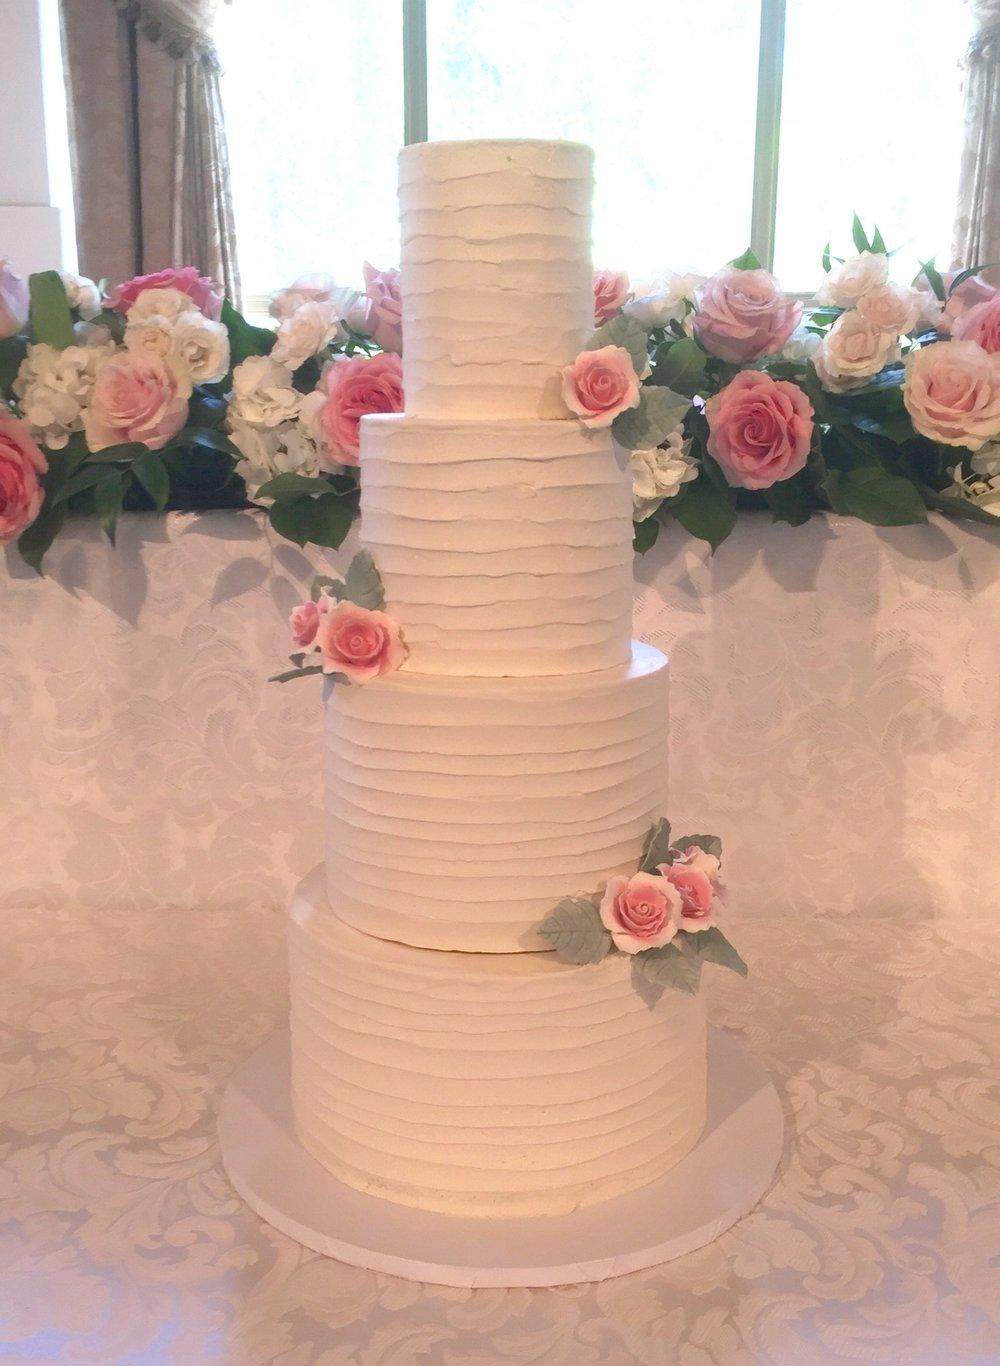 Buttercream Blush wedding cake